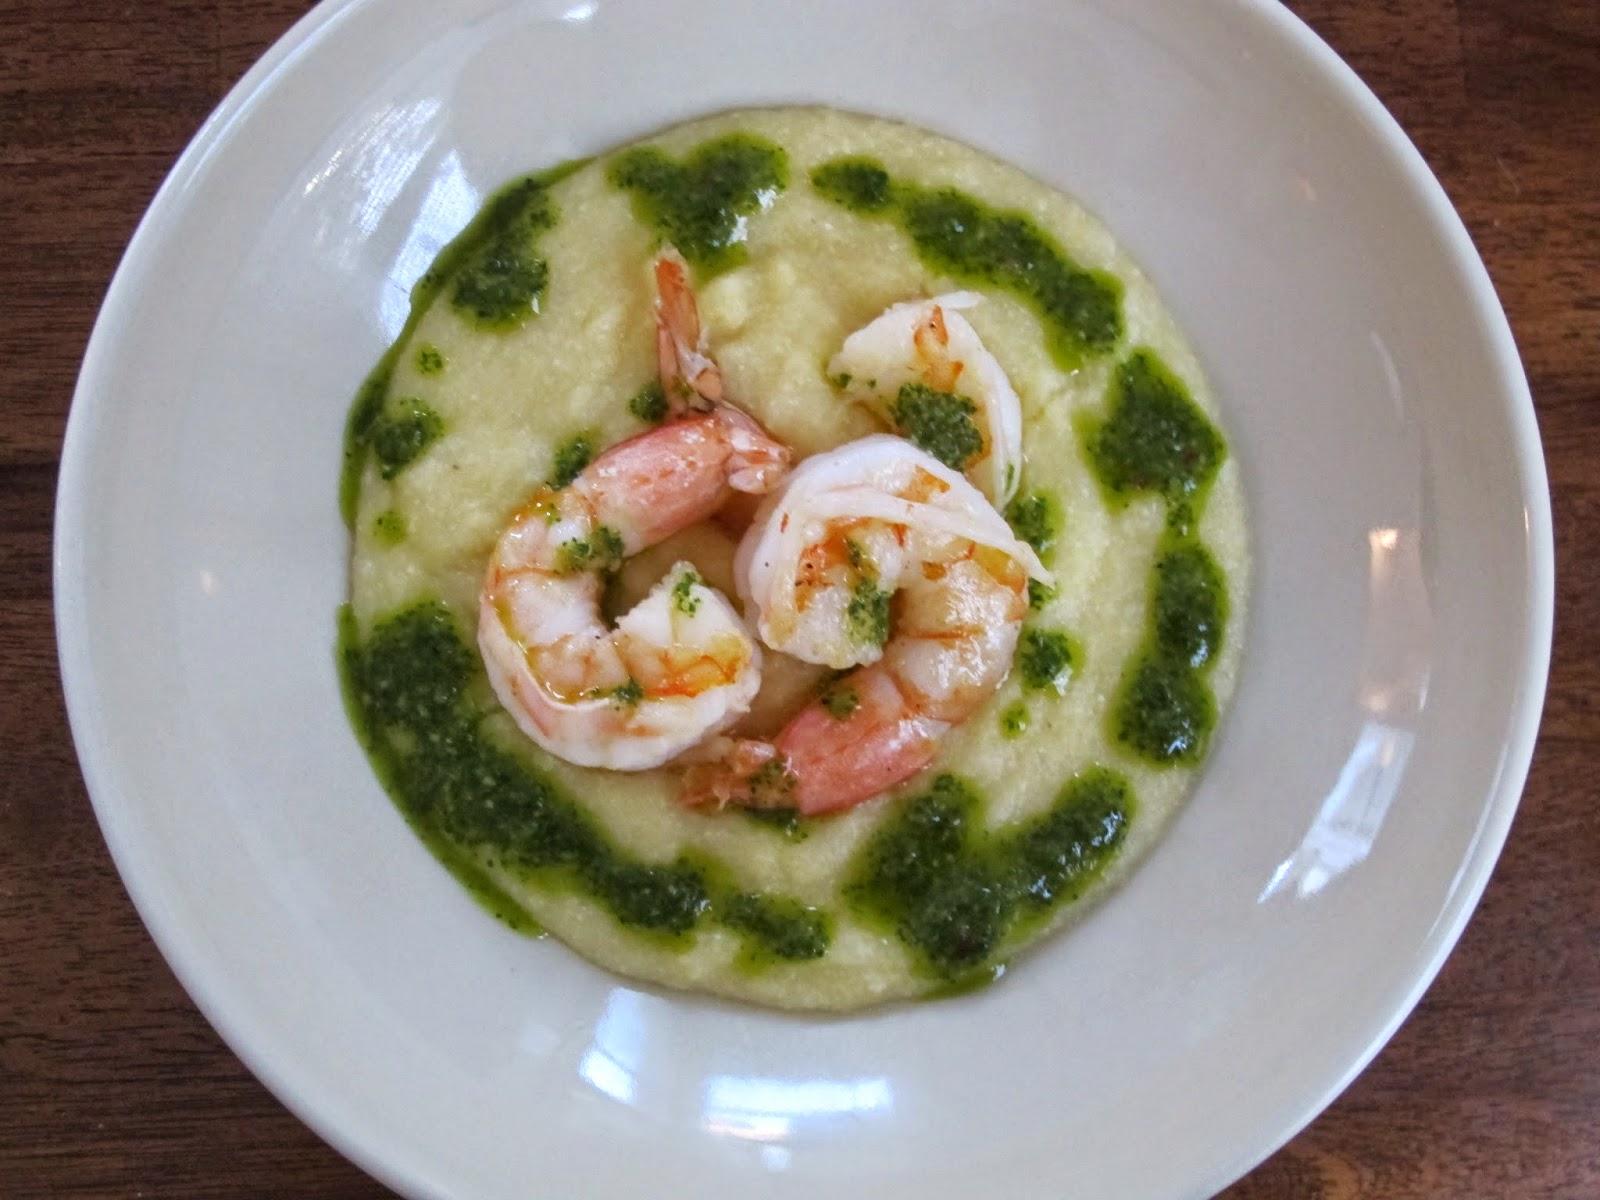 Shrimp with Three-Herb Chimichurri Sauce